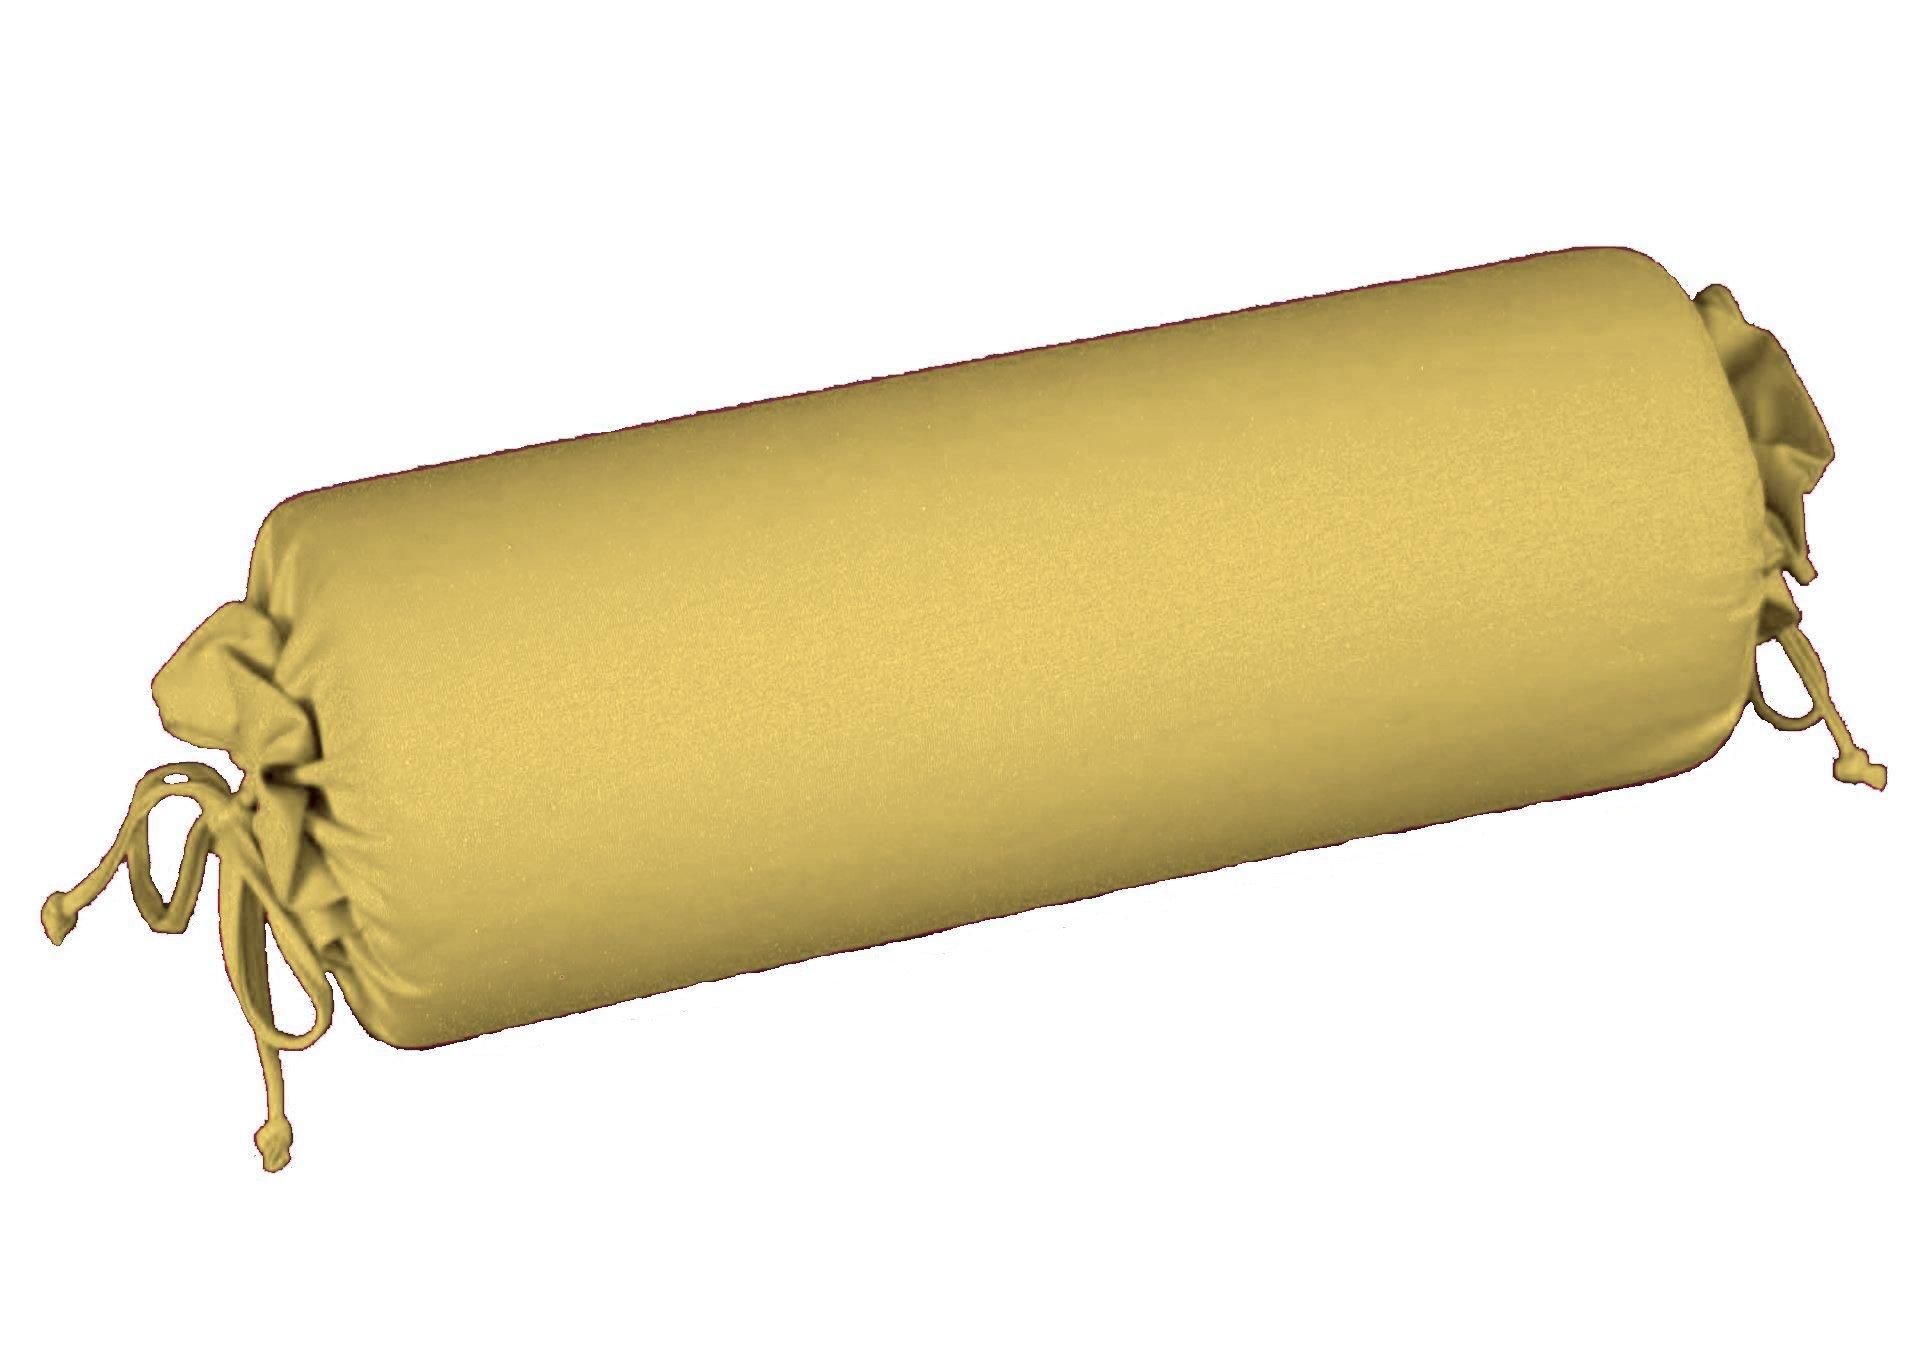 Edel-Zwirn-Jersey curry B15cm